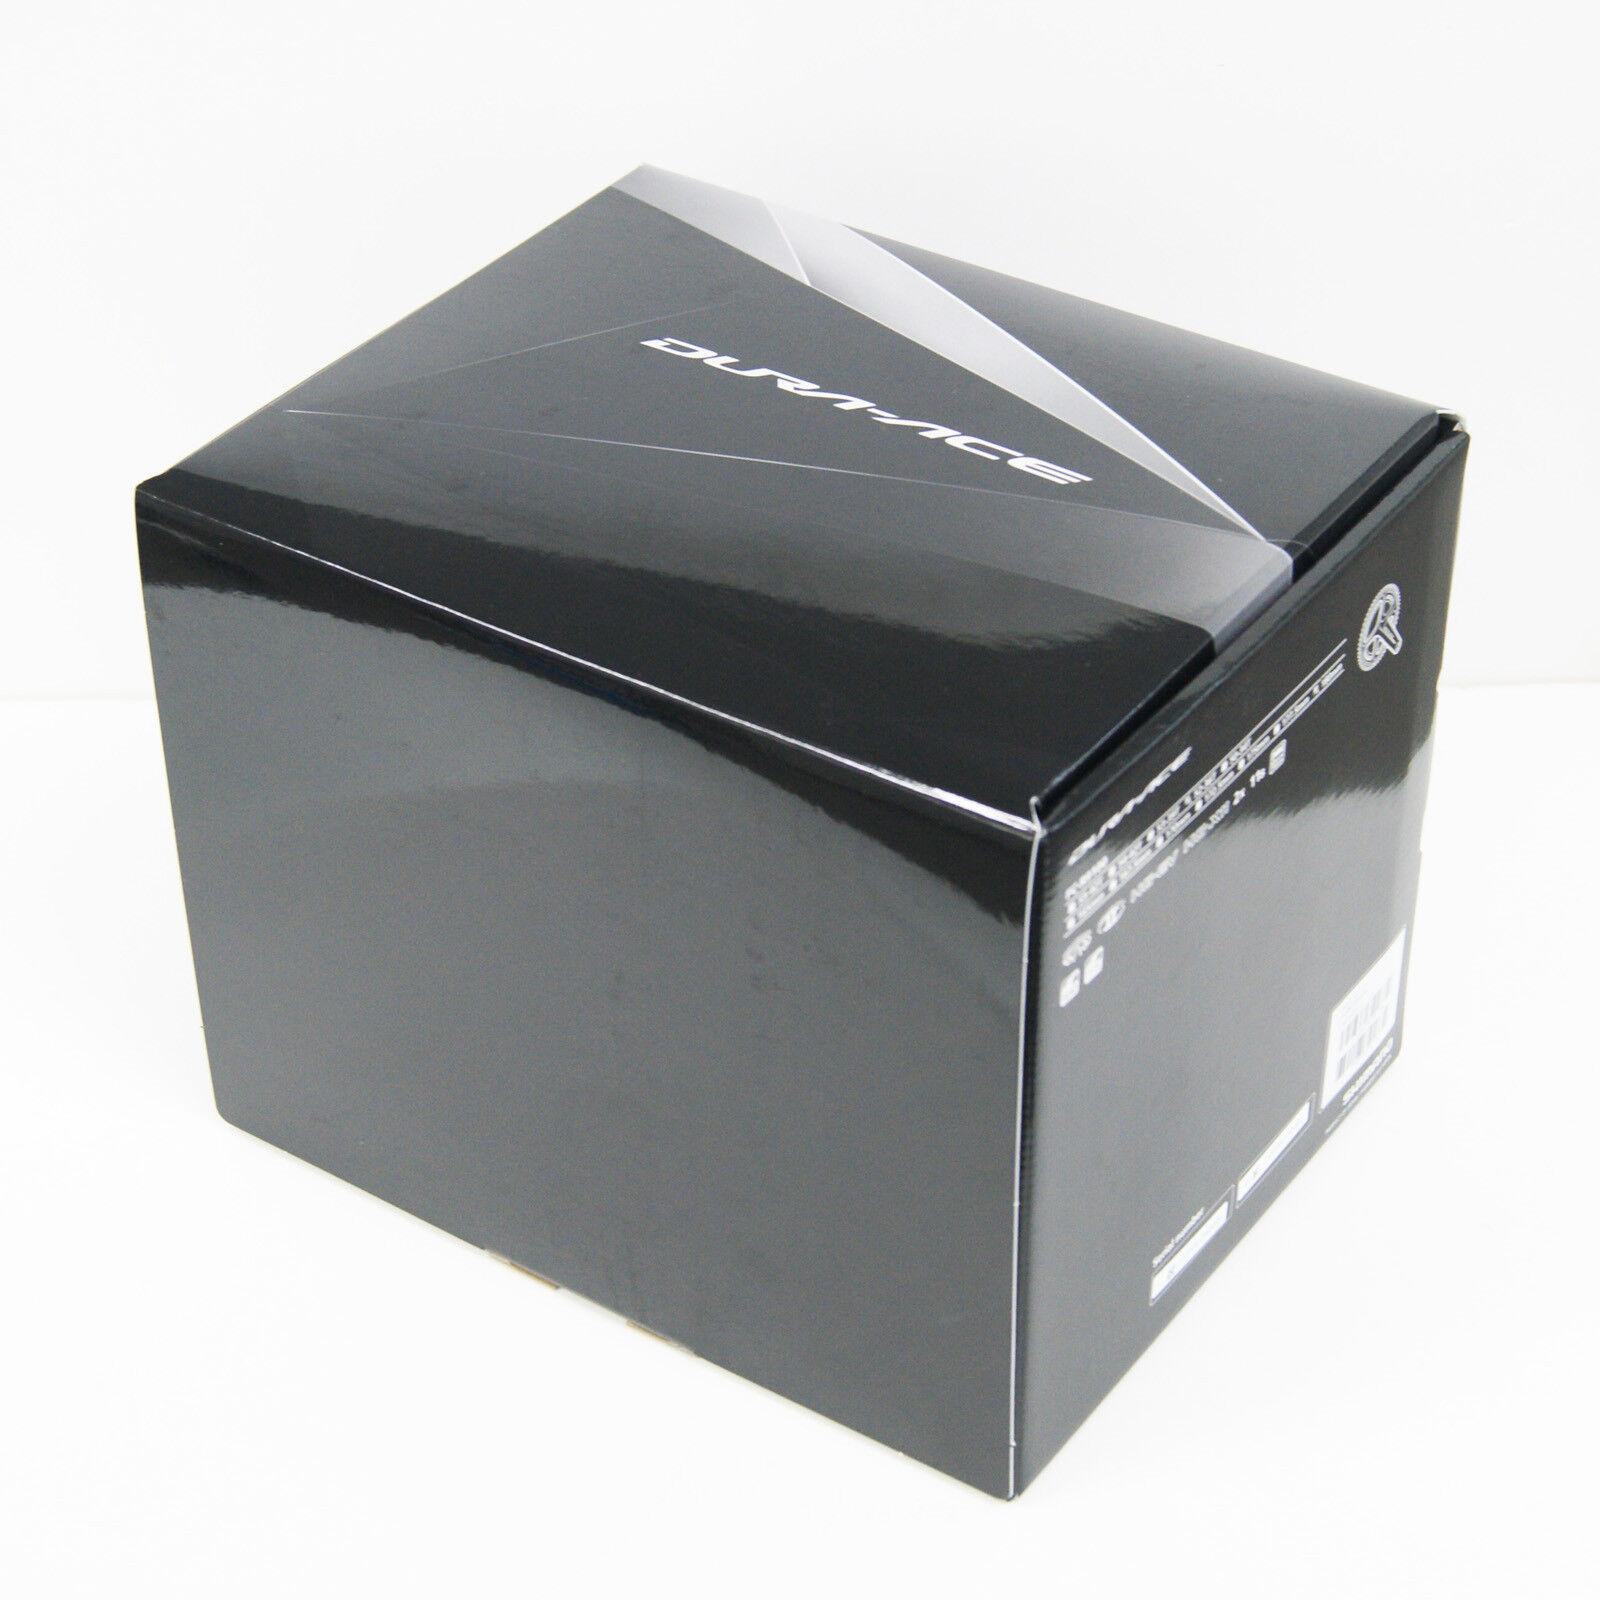 Shimano Dura-Ace FC-R9100 52-36T 180mm 11-Speed Kurbelgarnitur IFCR9100GX26